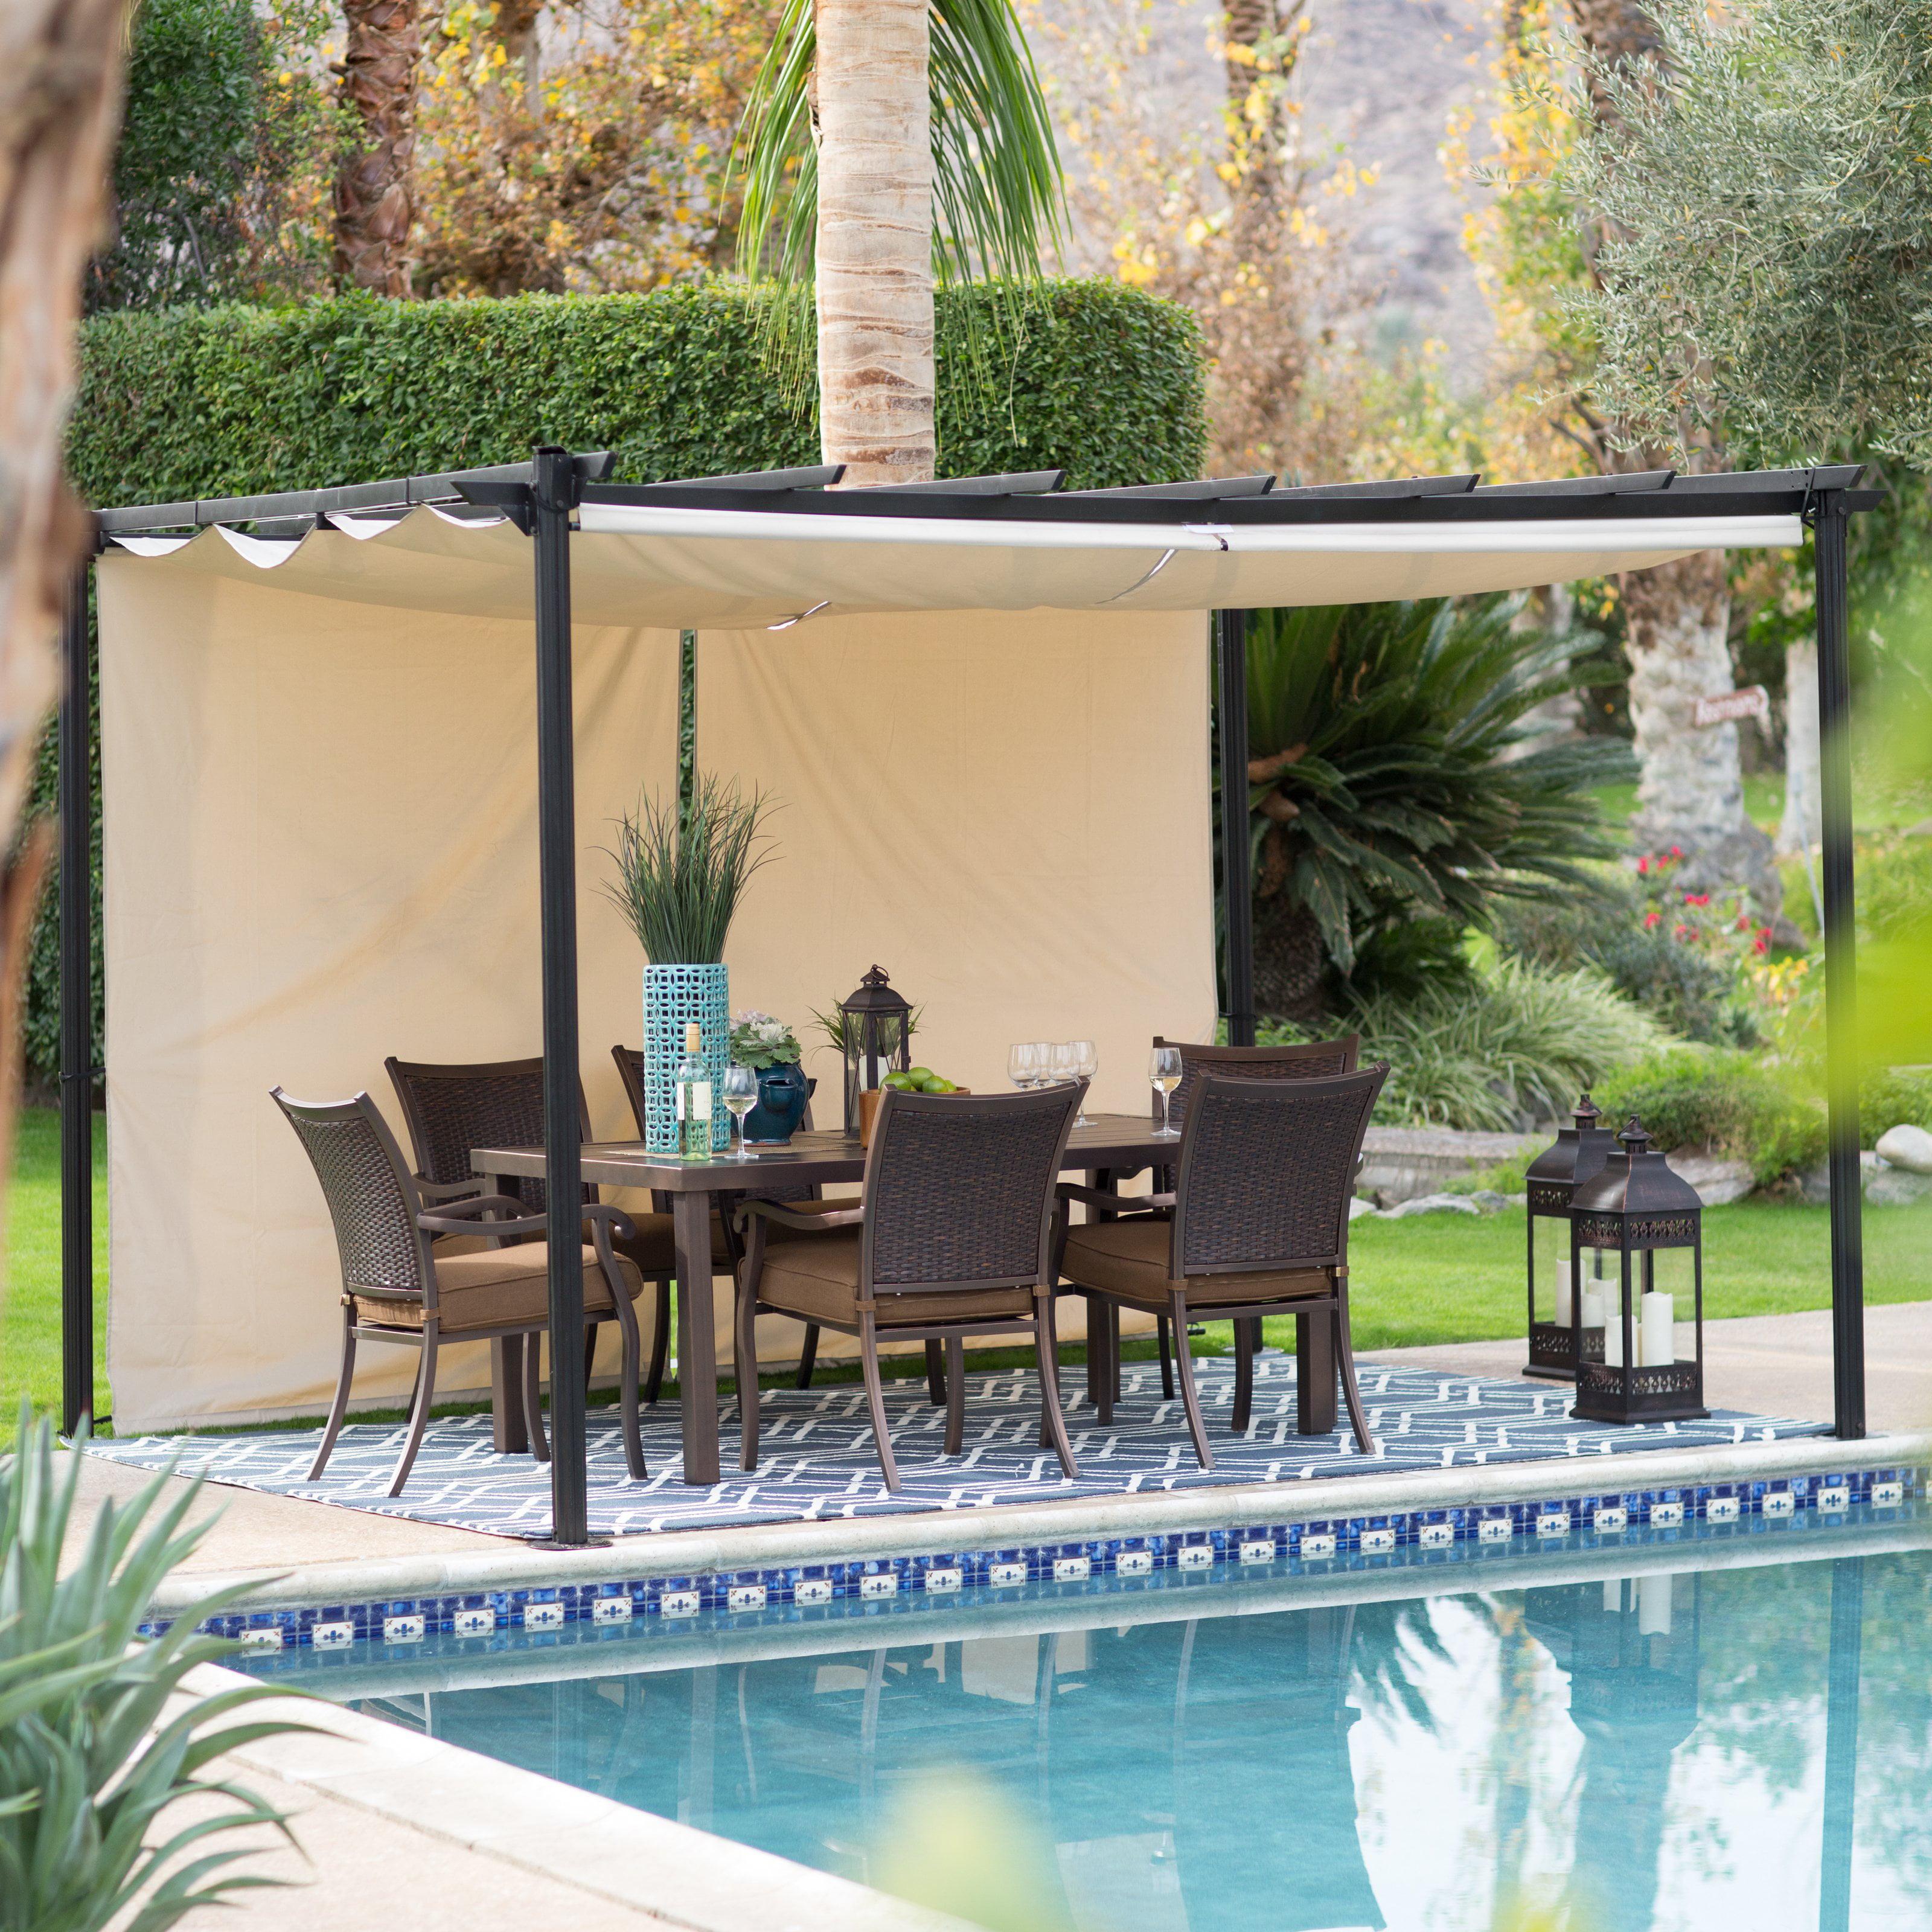 belham living steel outdoor pergola gazebo with retractable canopy shades walmartcom